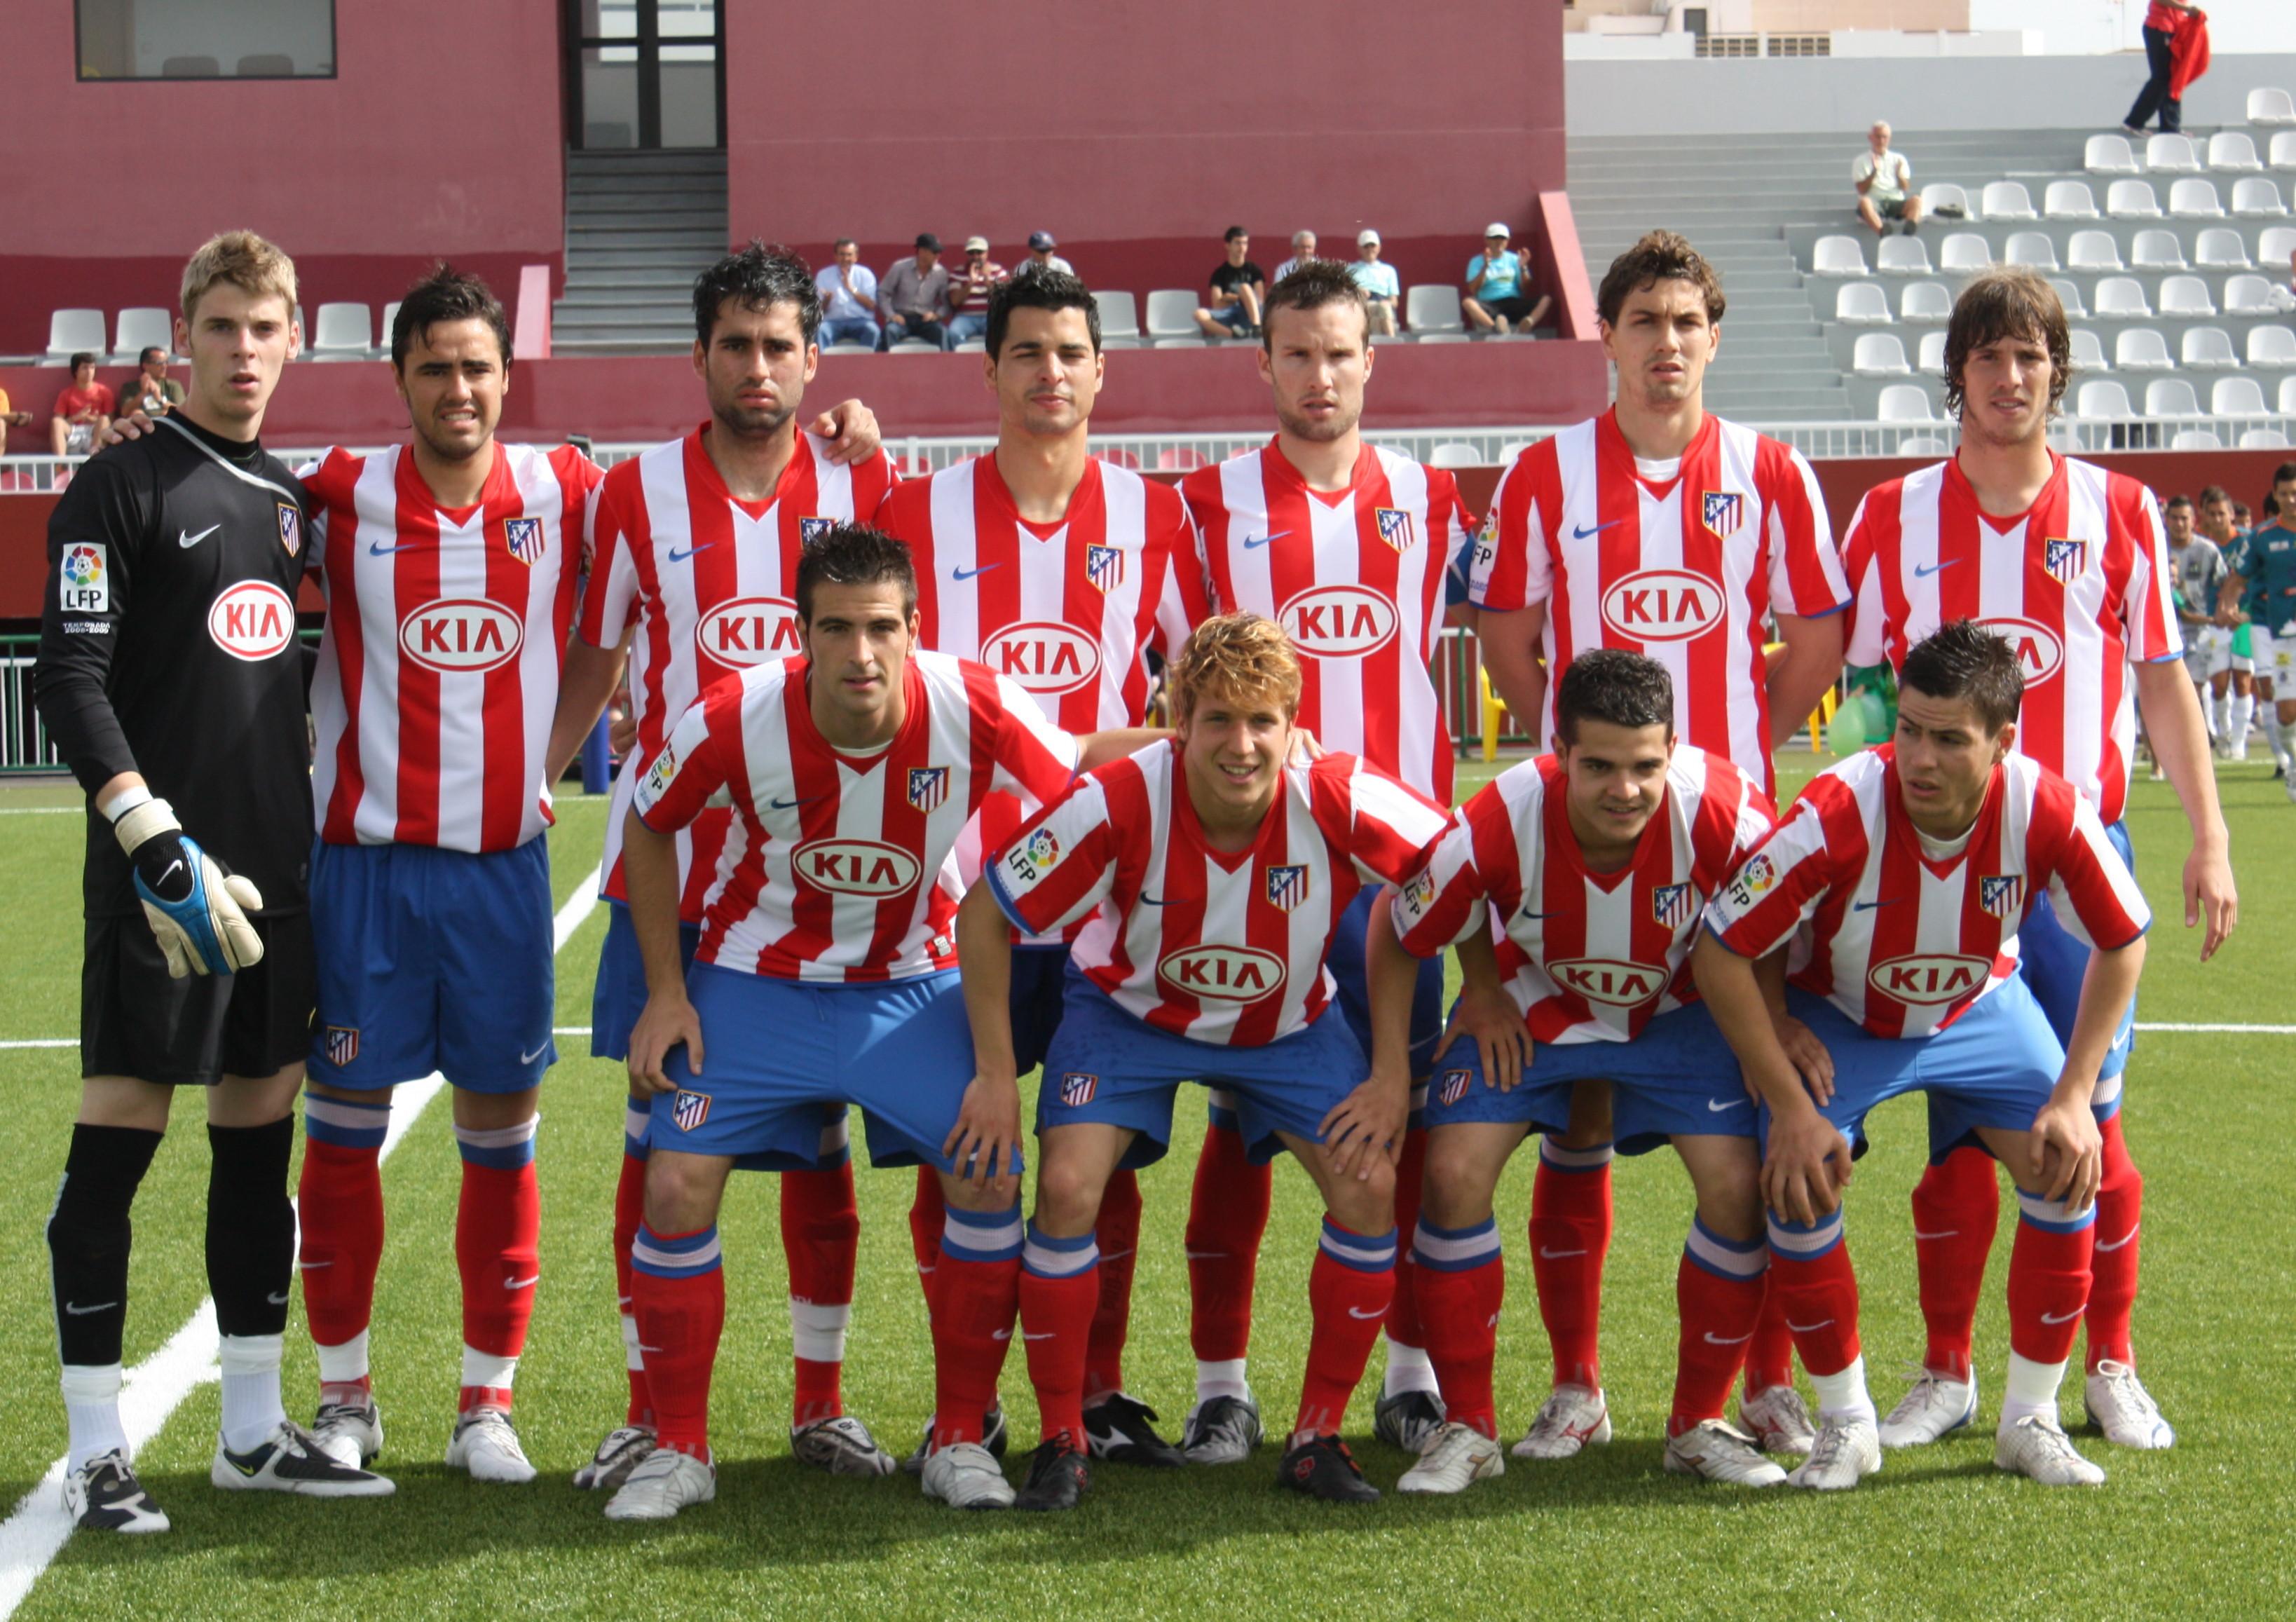 atletico madrid - photo #26